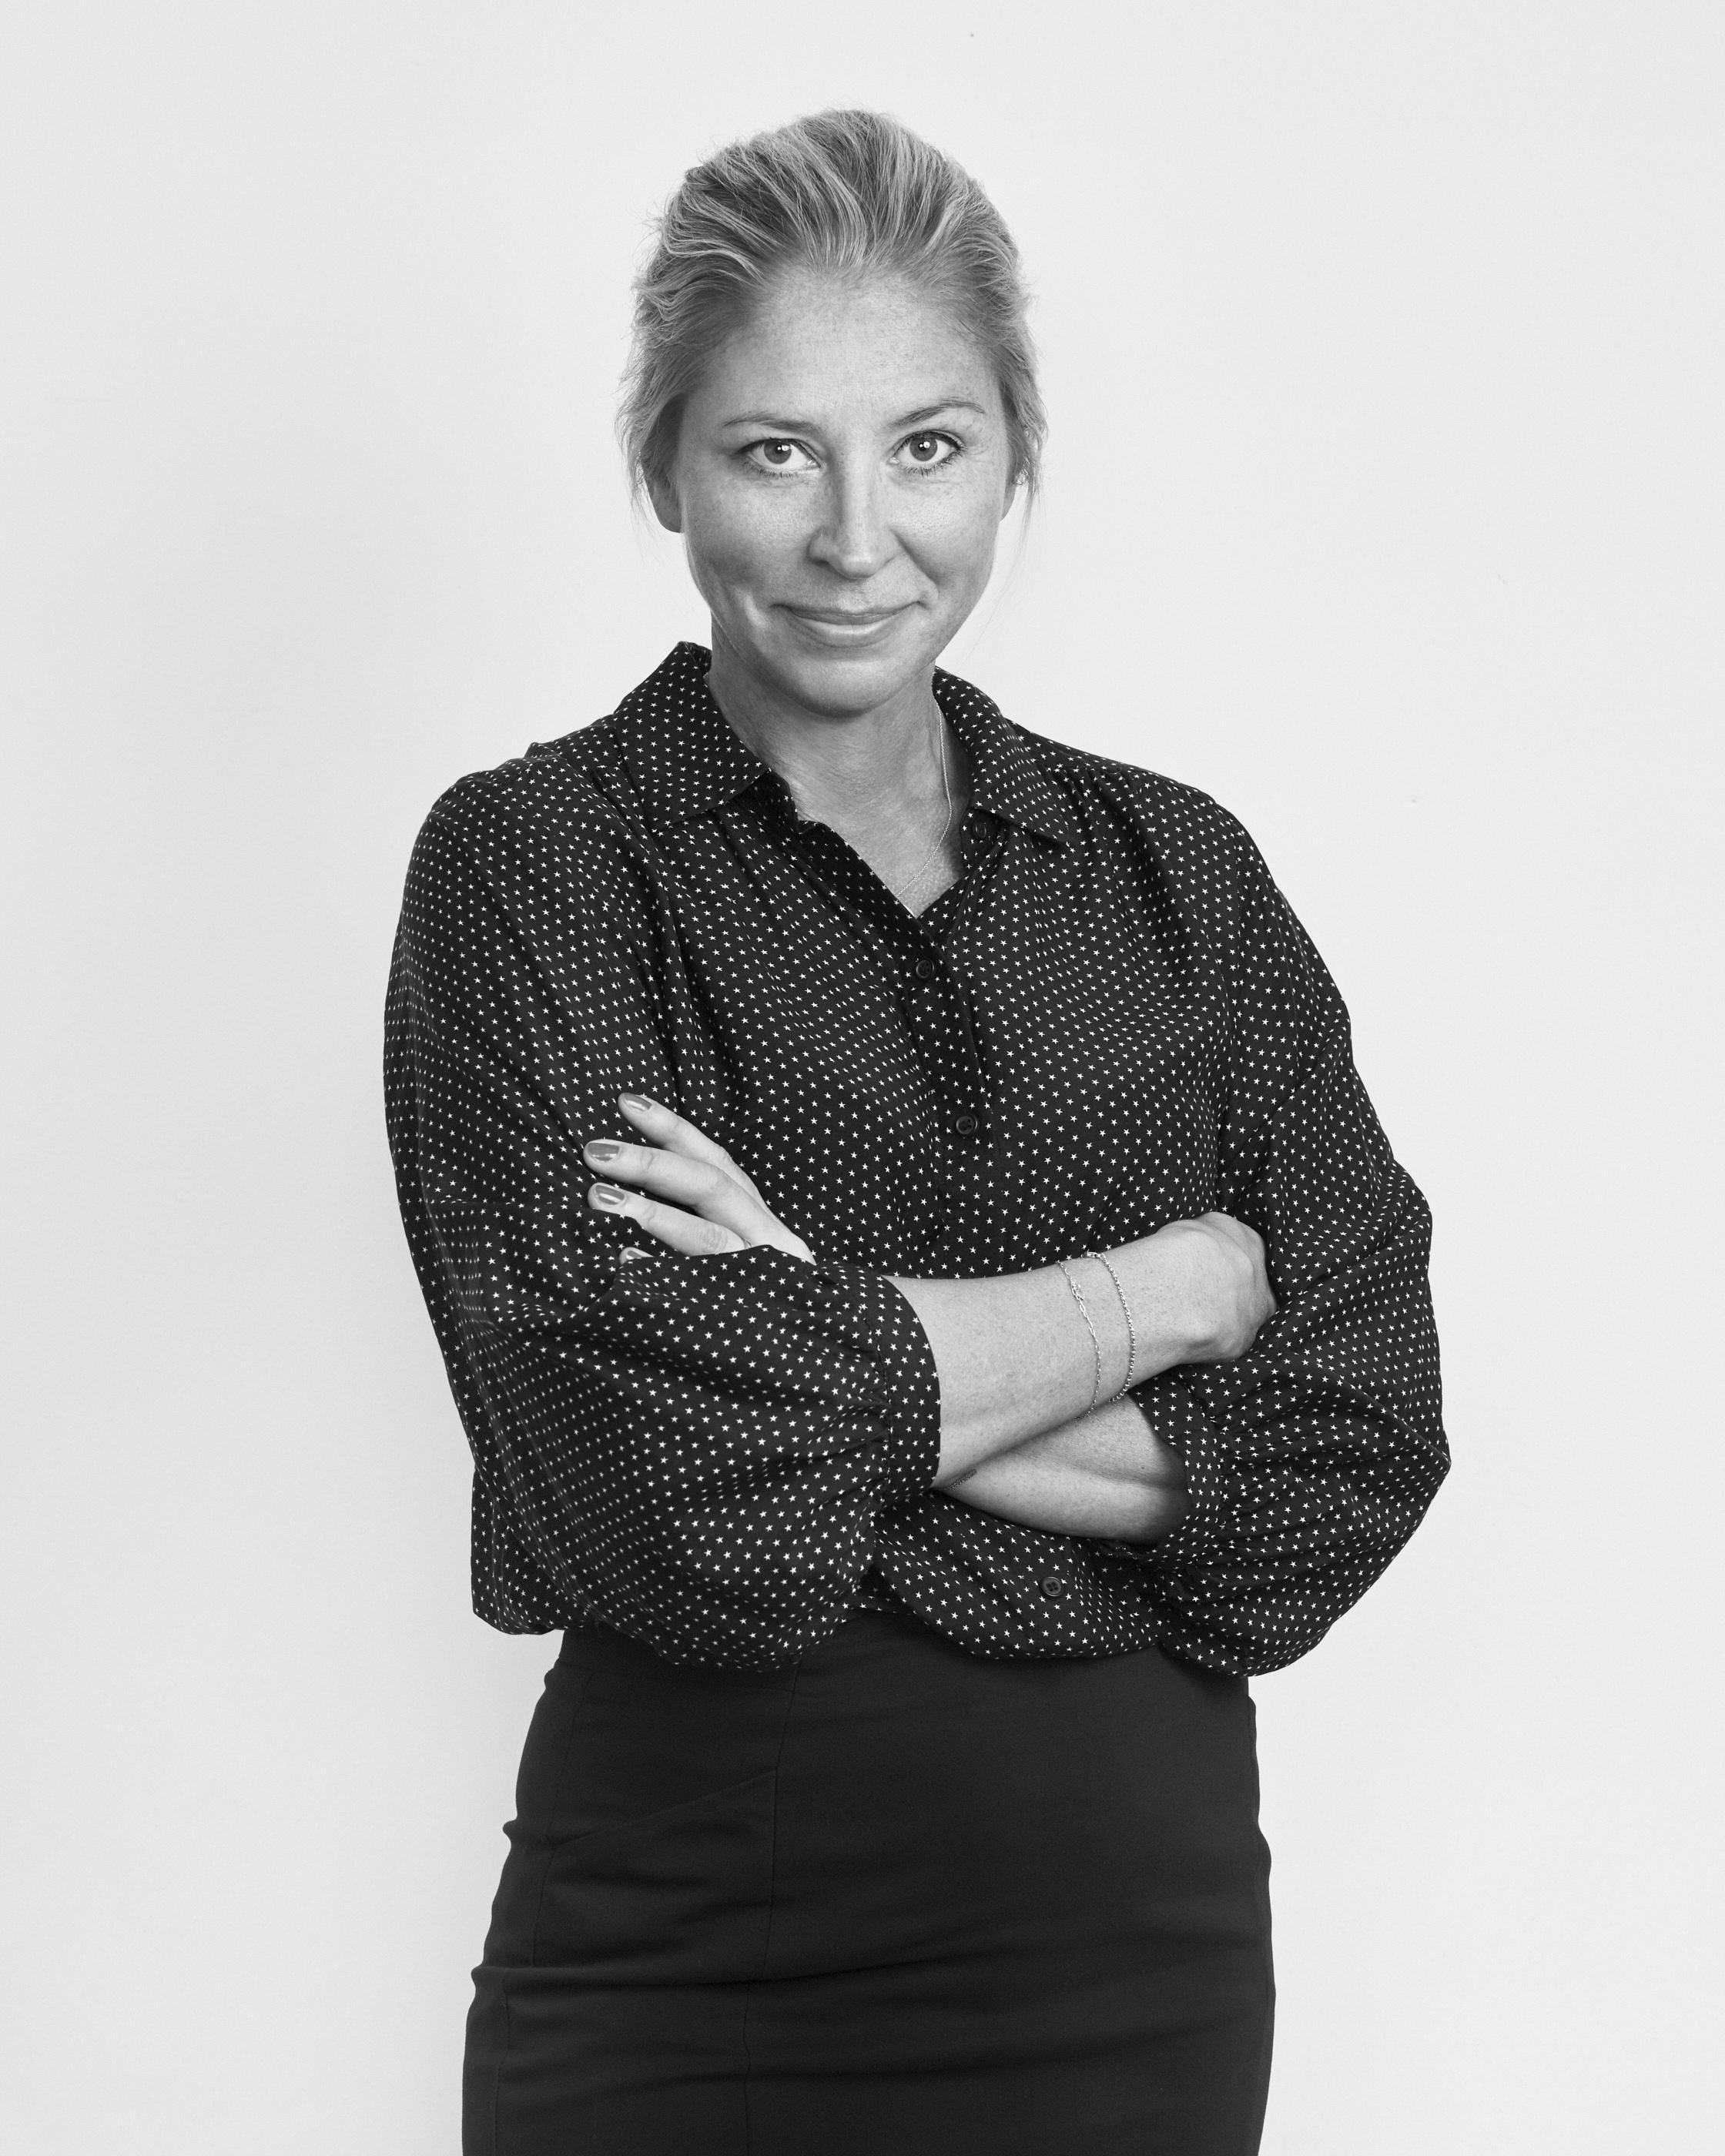 Theresa Geijstedt